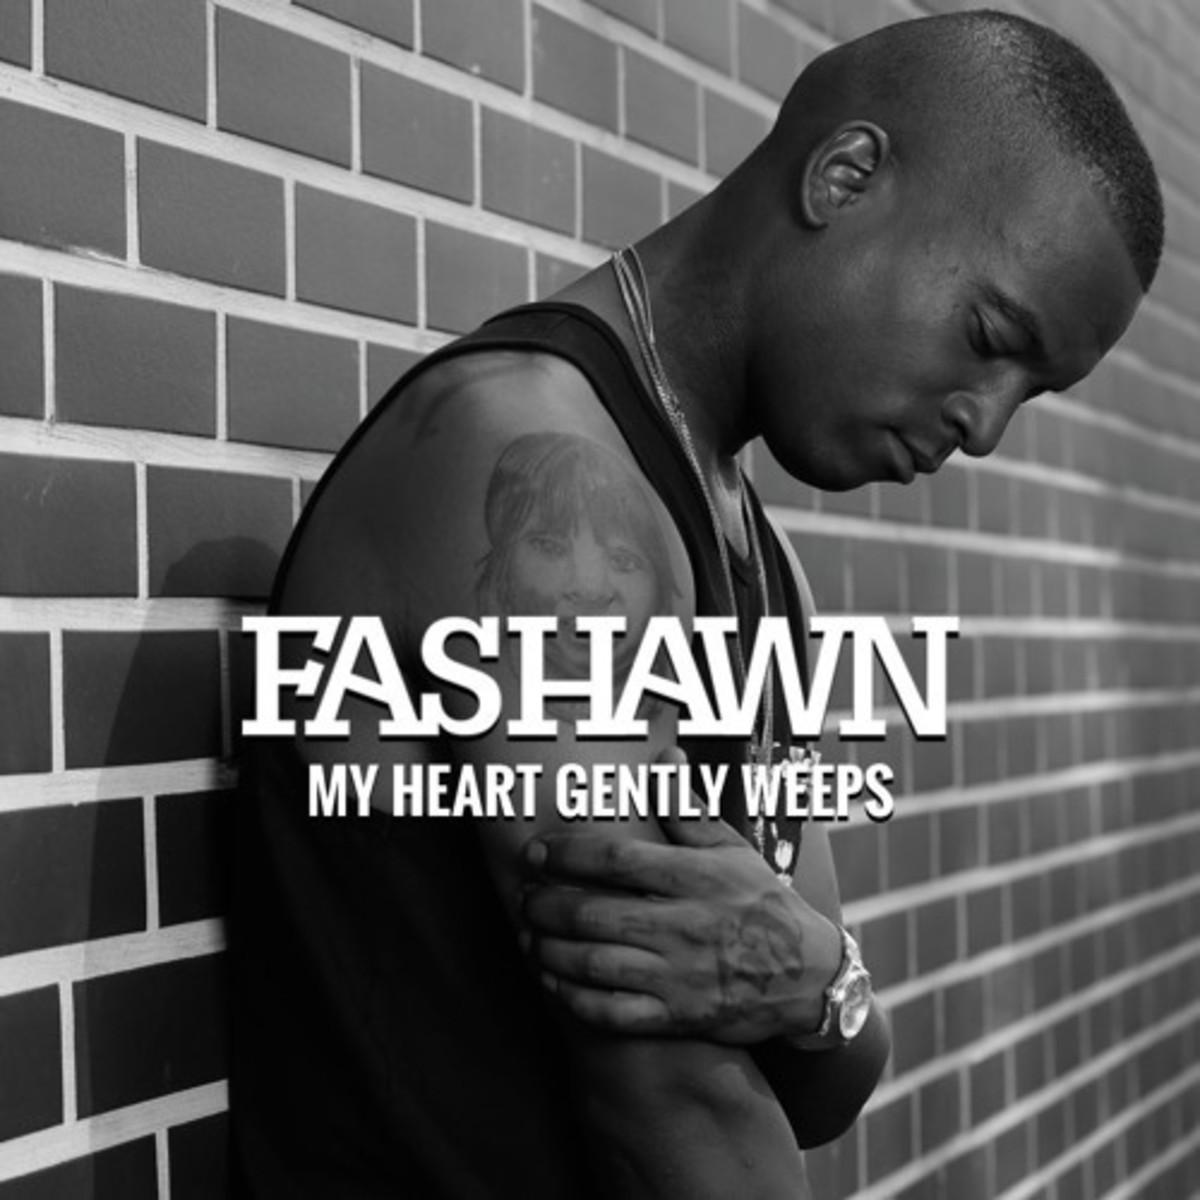 fashawn-heart-gently-weeps.jpg